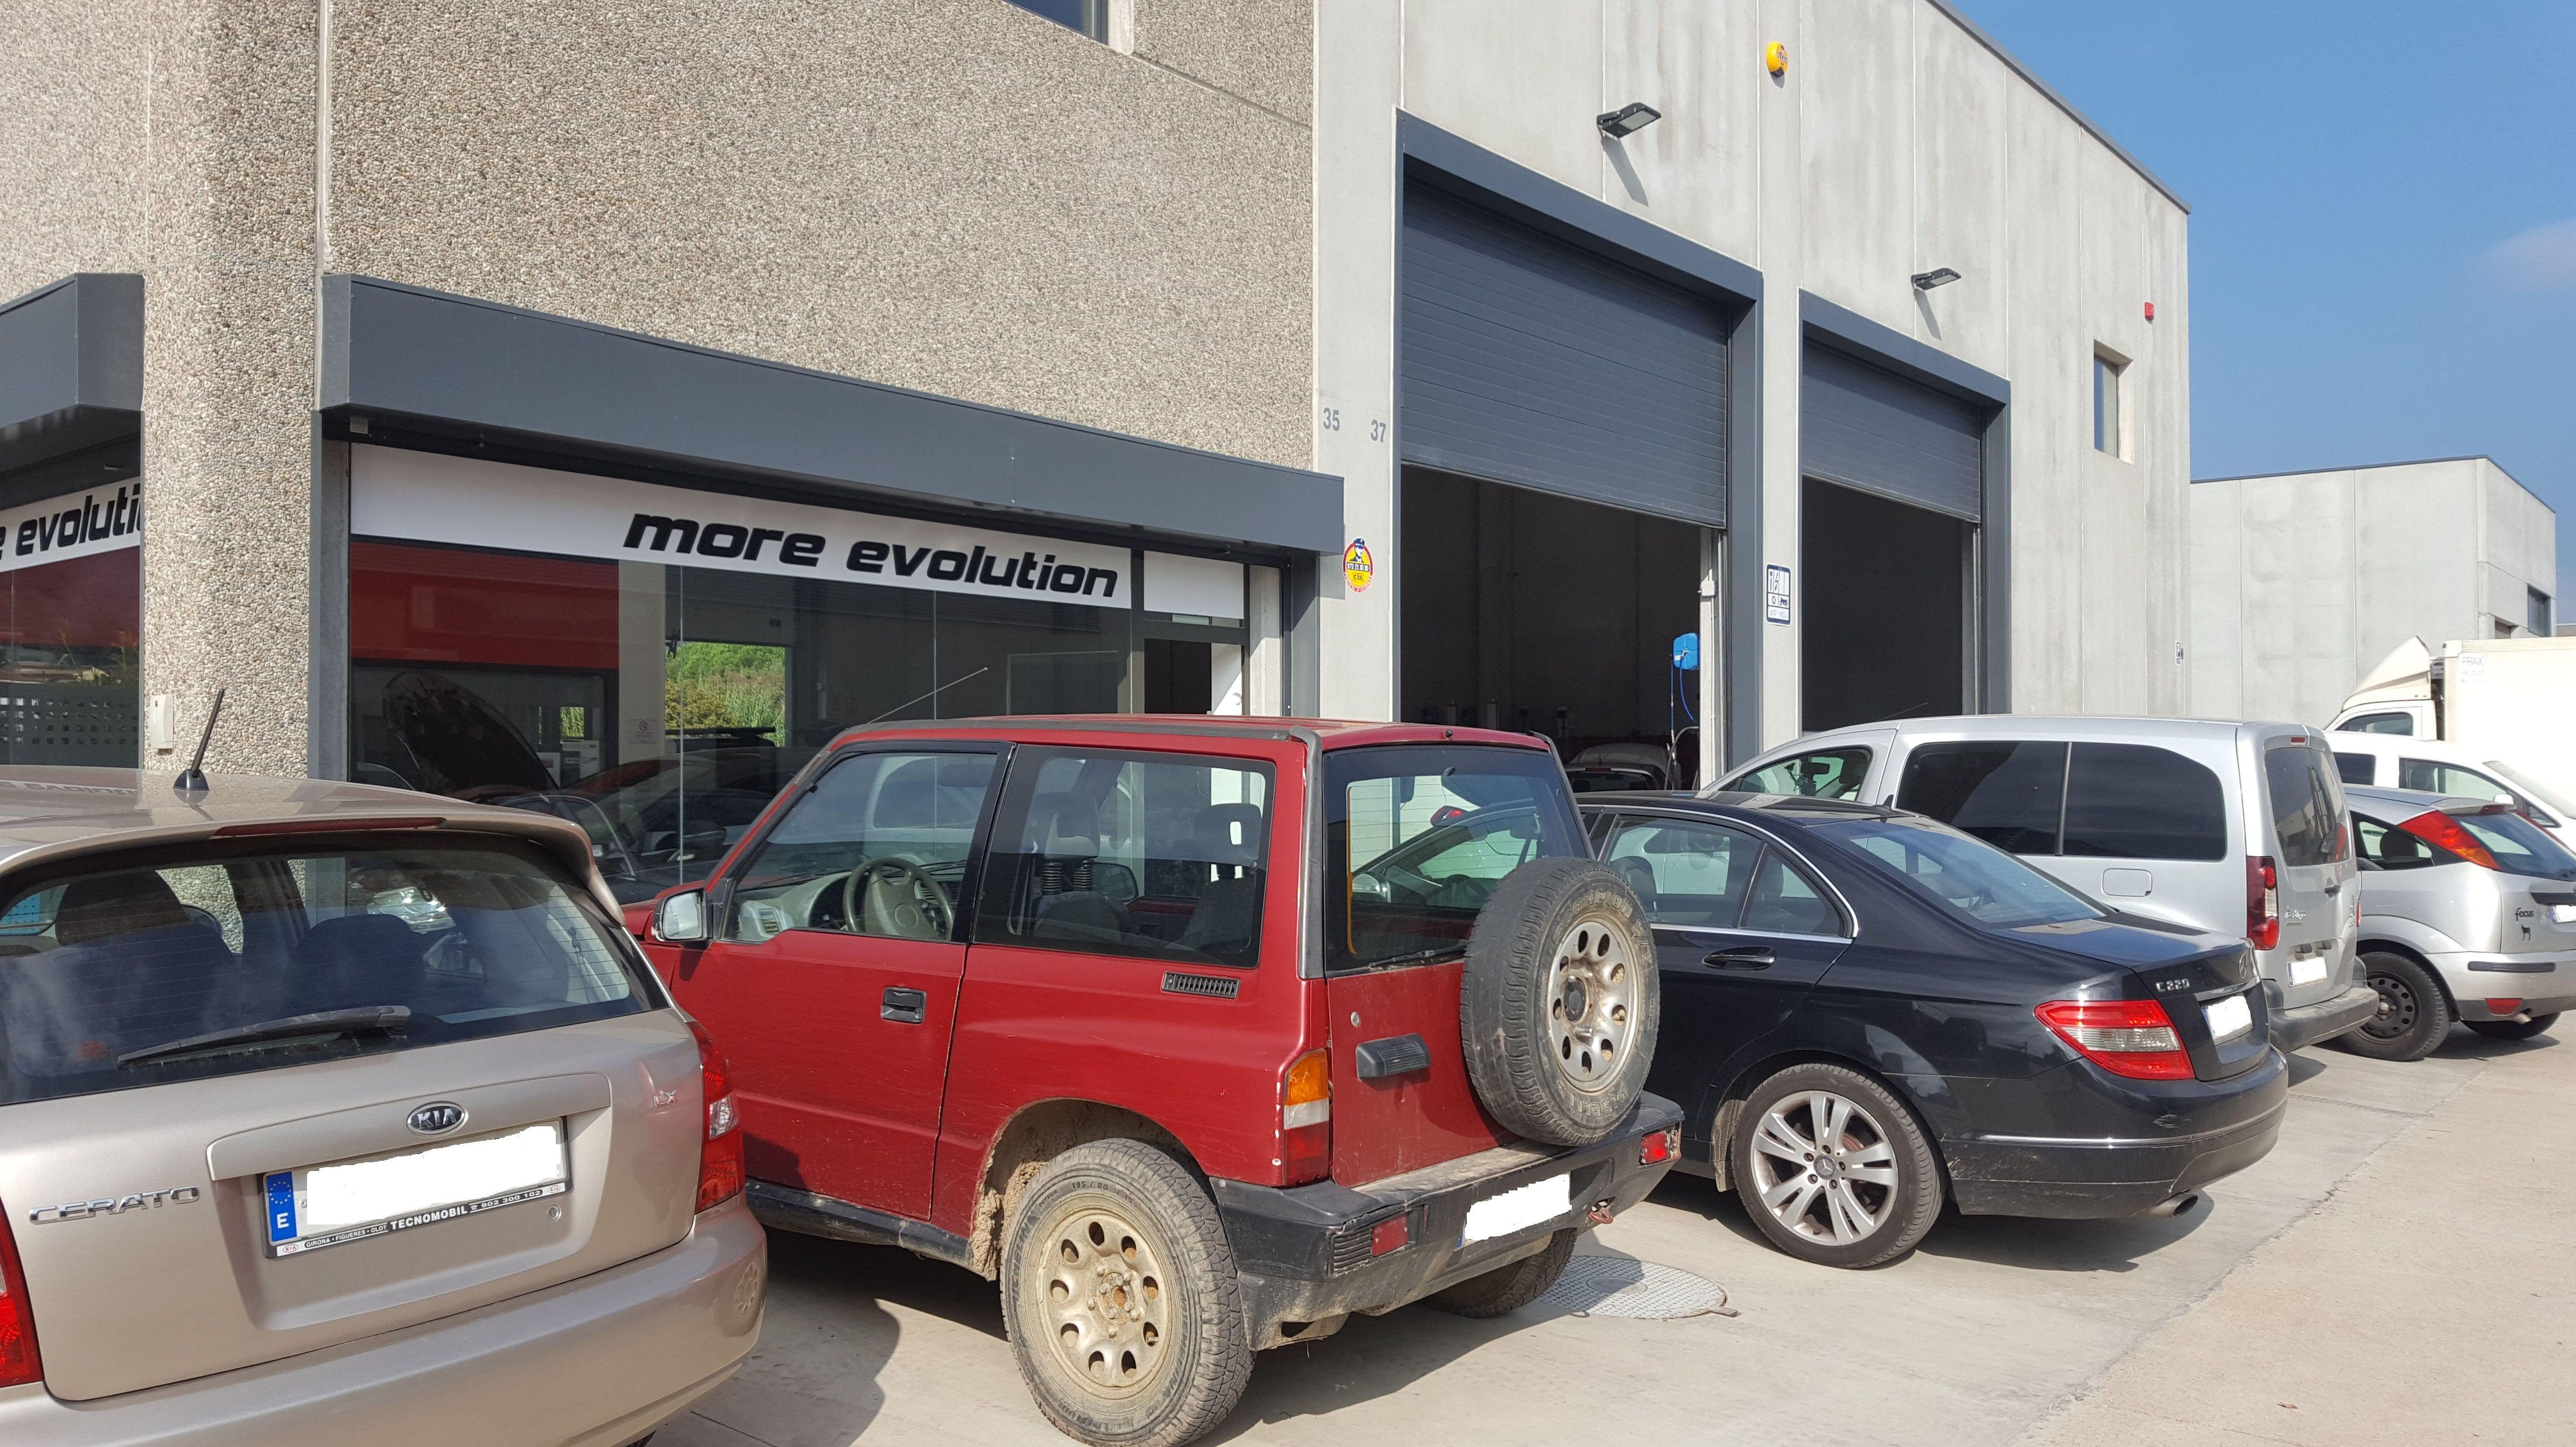 Foto 10 de Talleres de automóviles en La Cellera de Ter | Taller Mecànic Moreevolution